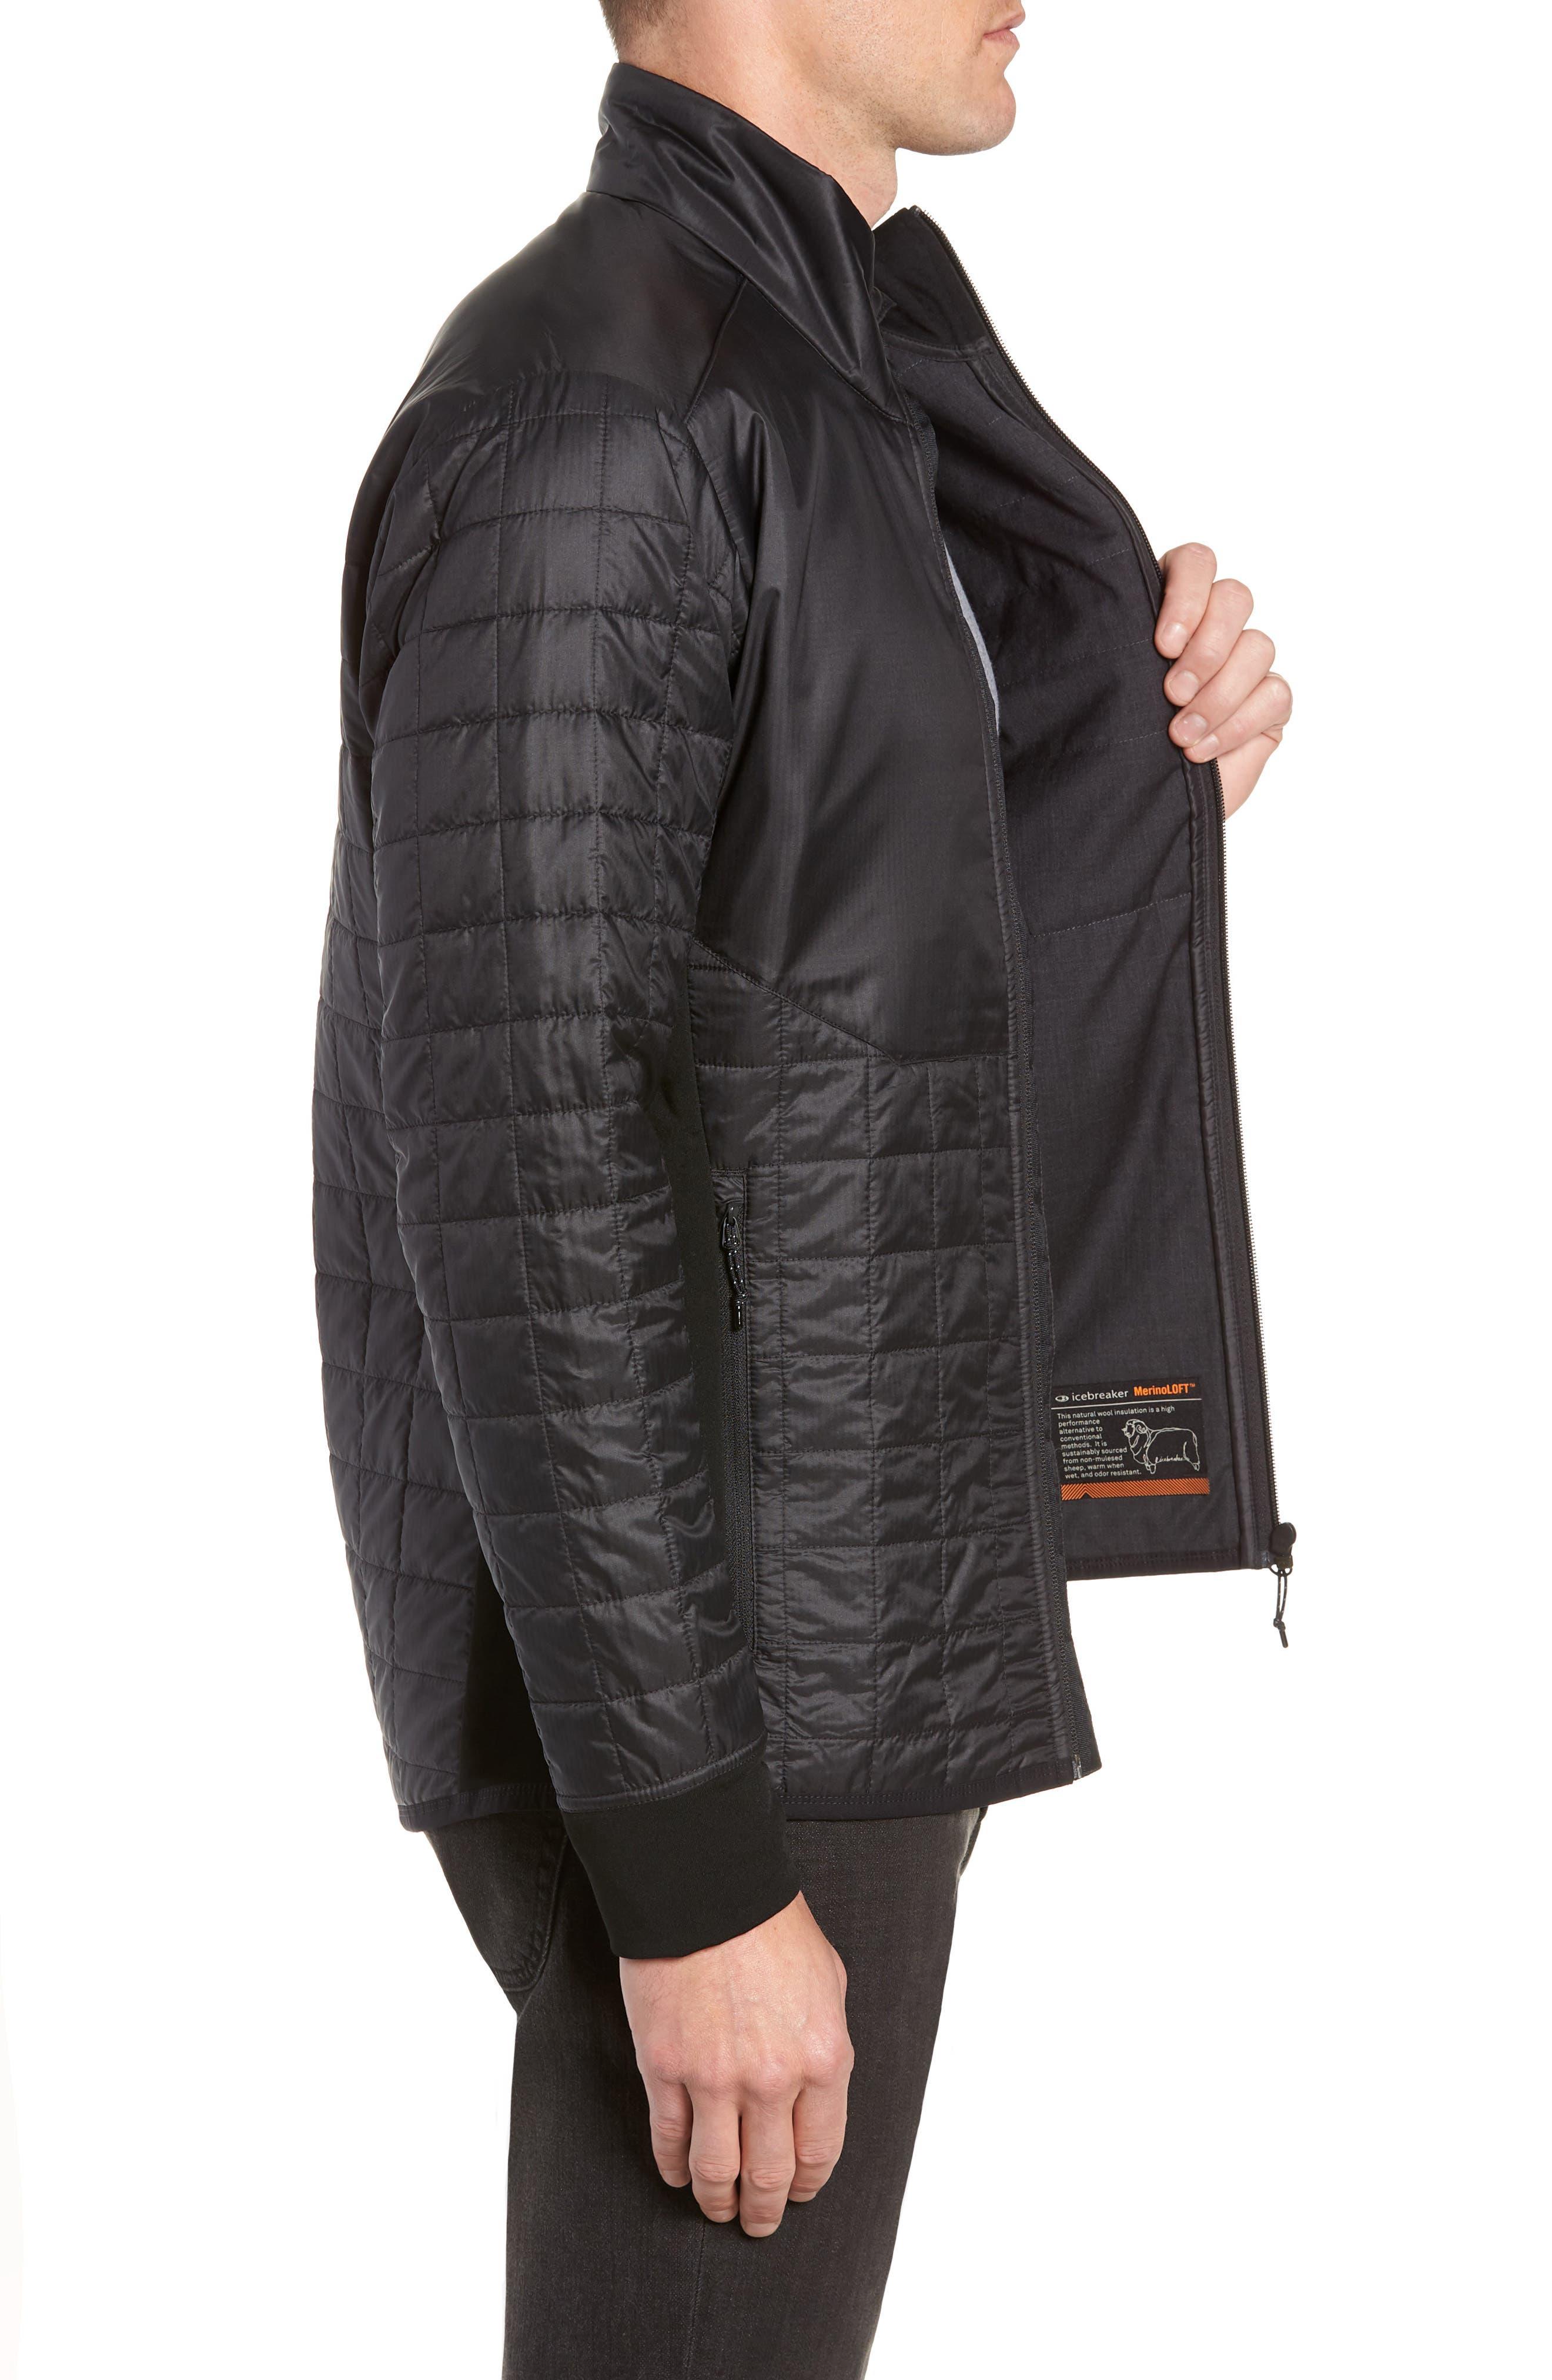 MerinoLOFT<sup>™</sup> Helix Midlayer Zip Jacket,                             Alternate thumbnail 3, color,                             BLACK/ JET HEATHER